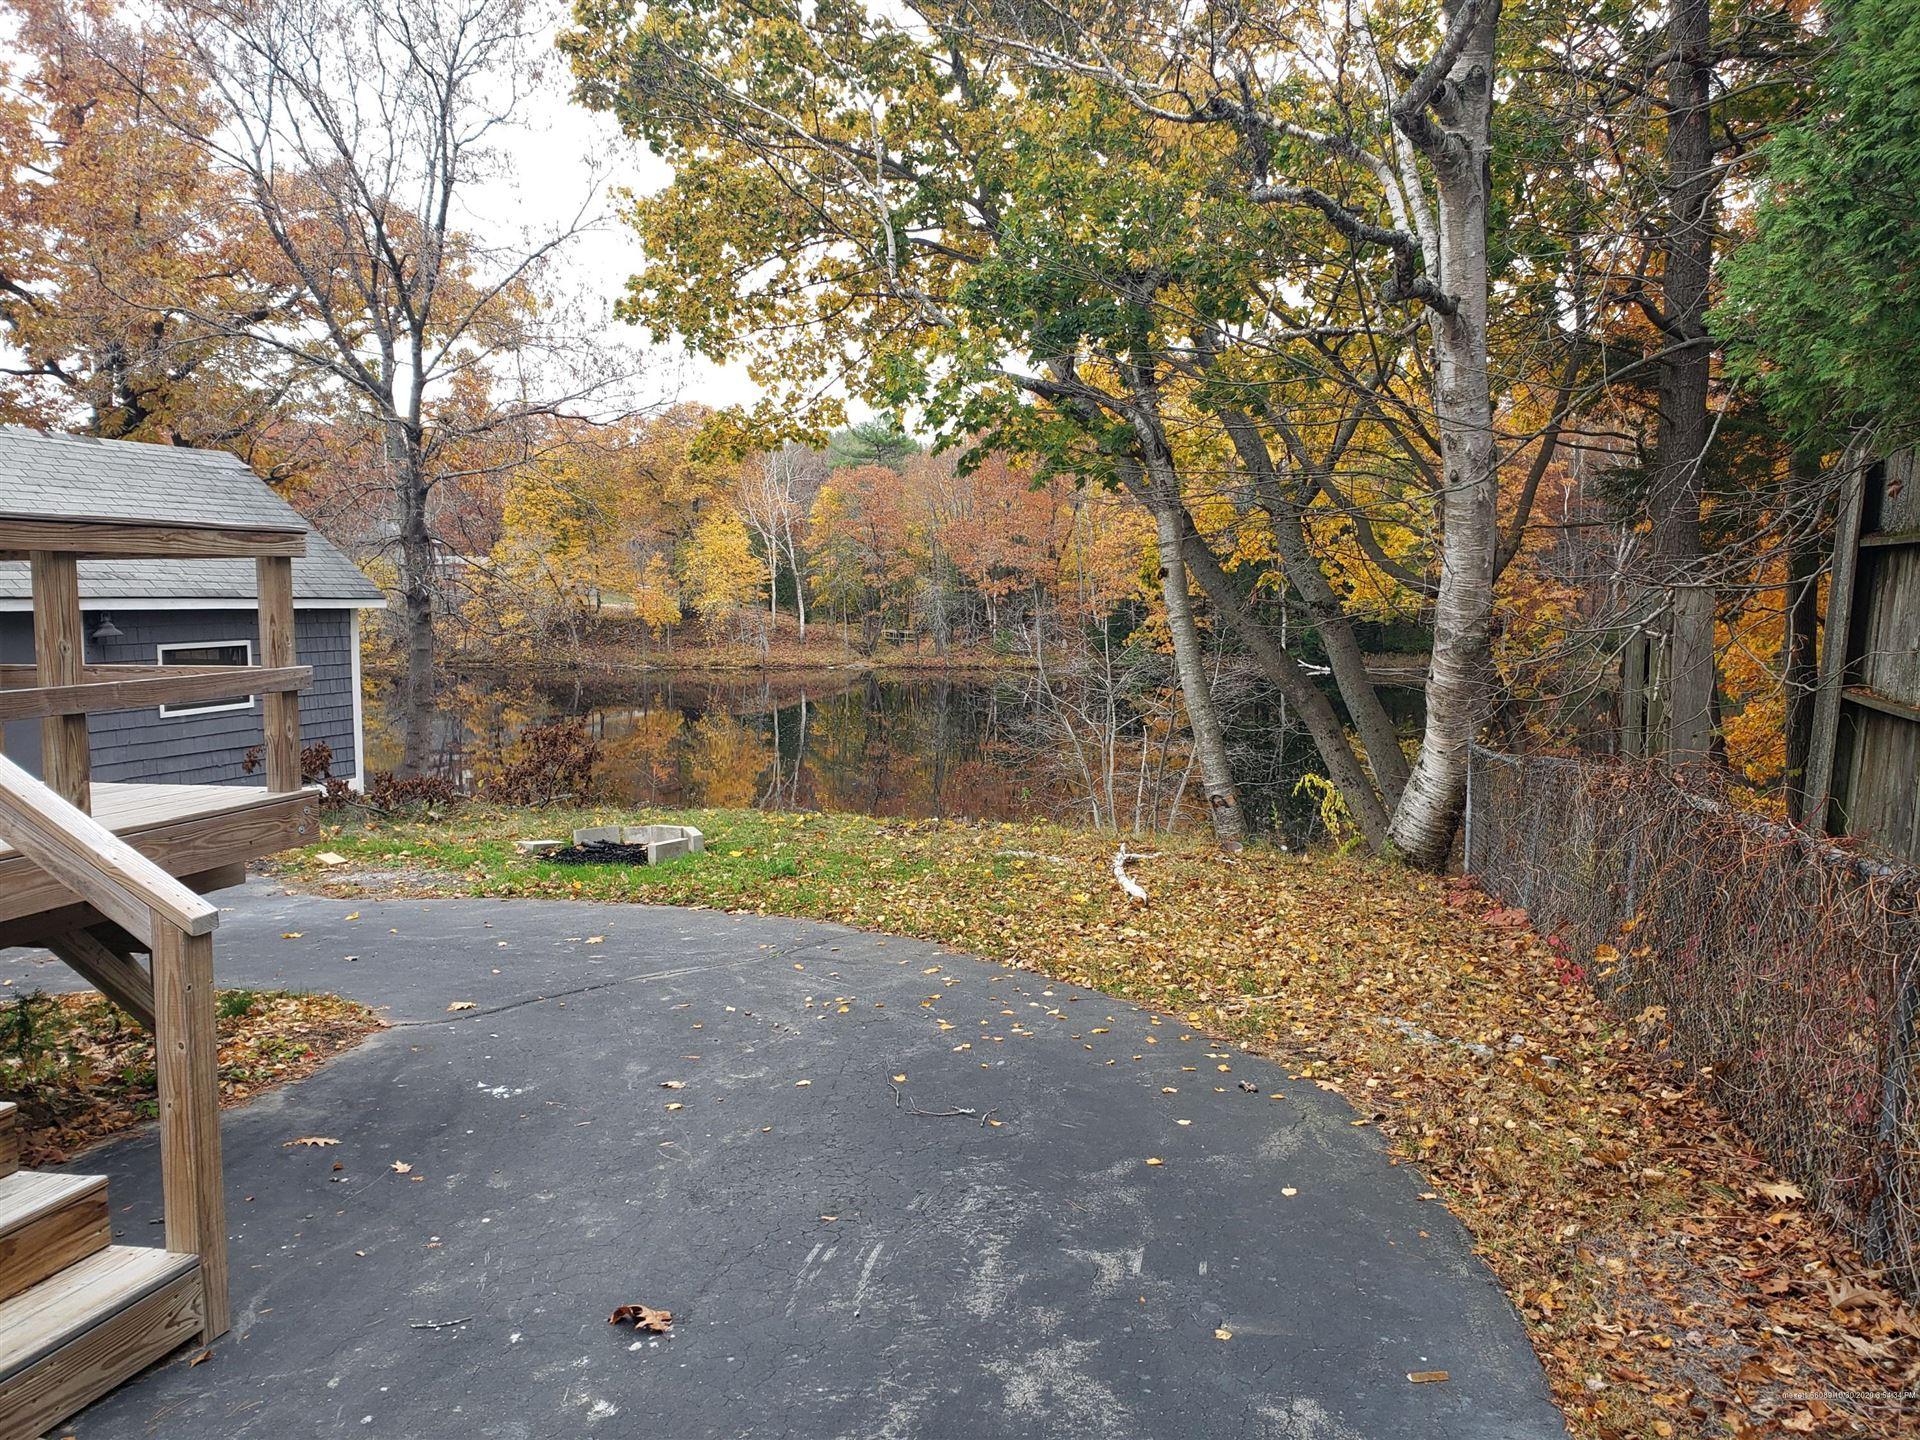 Photo of 6 Bunker Avenue, Fairfield, ME 04937 (MLS # 1474442)